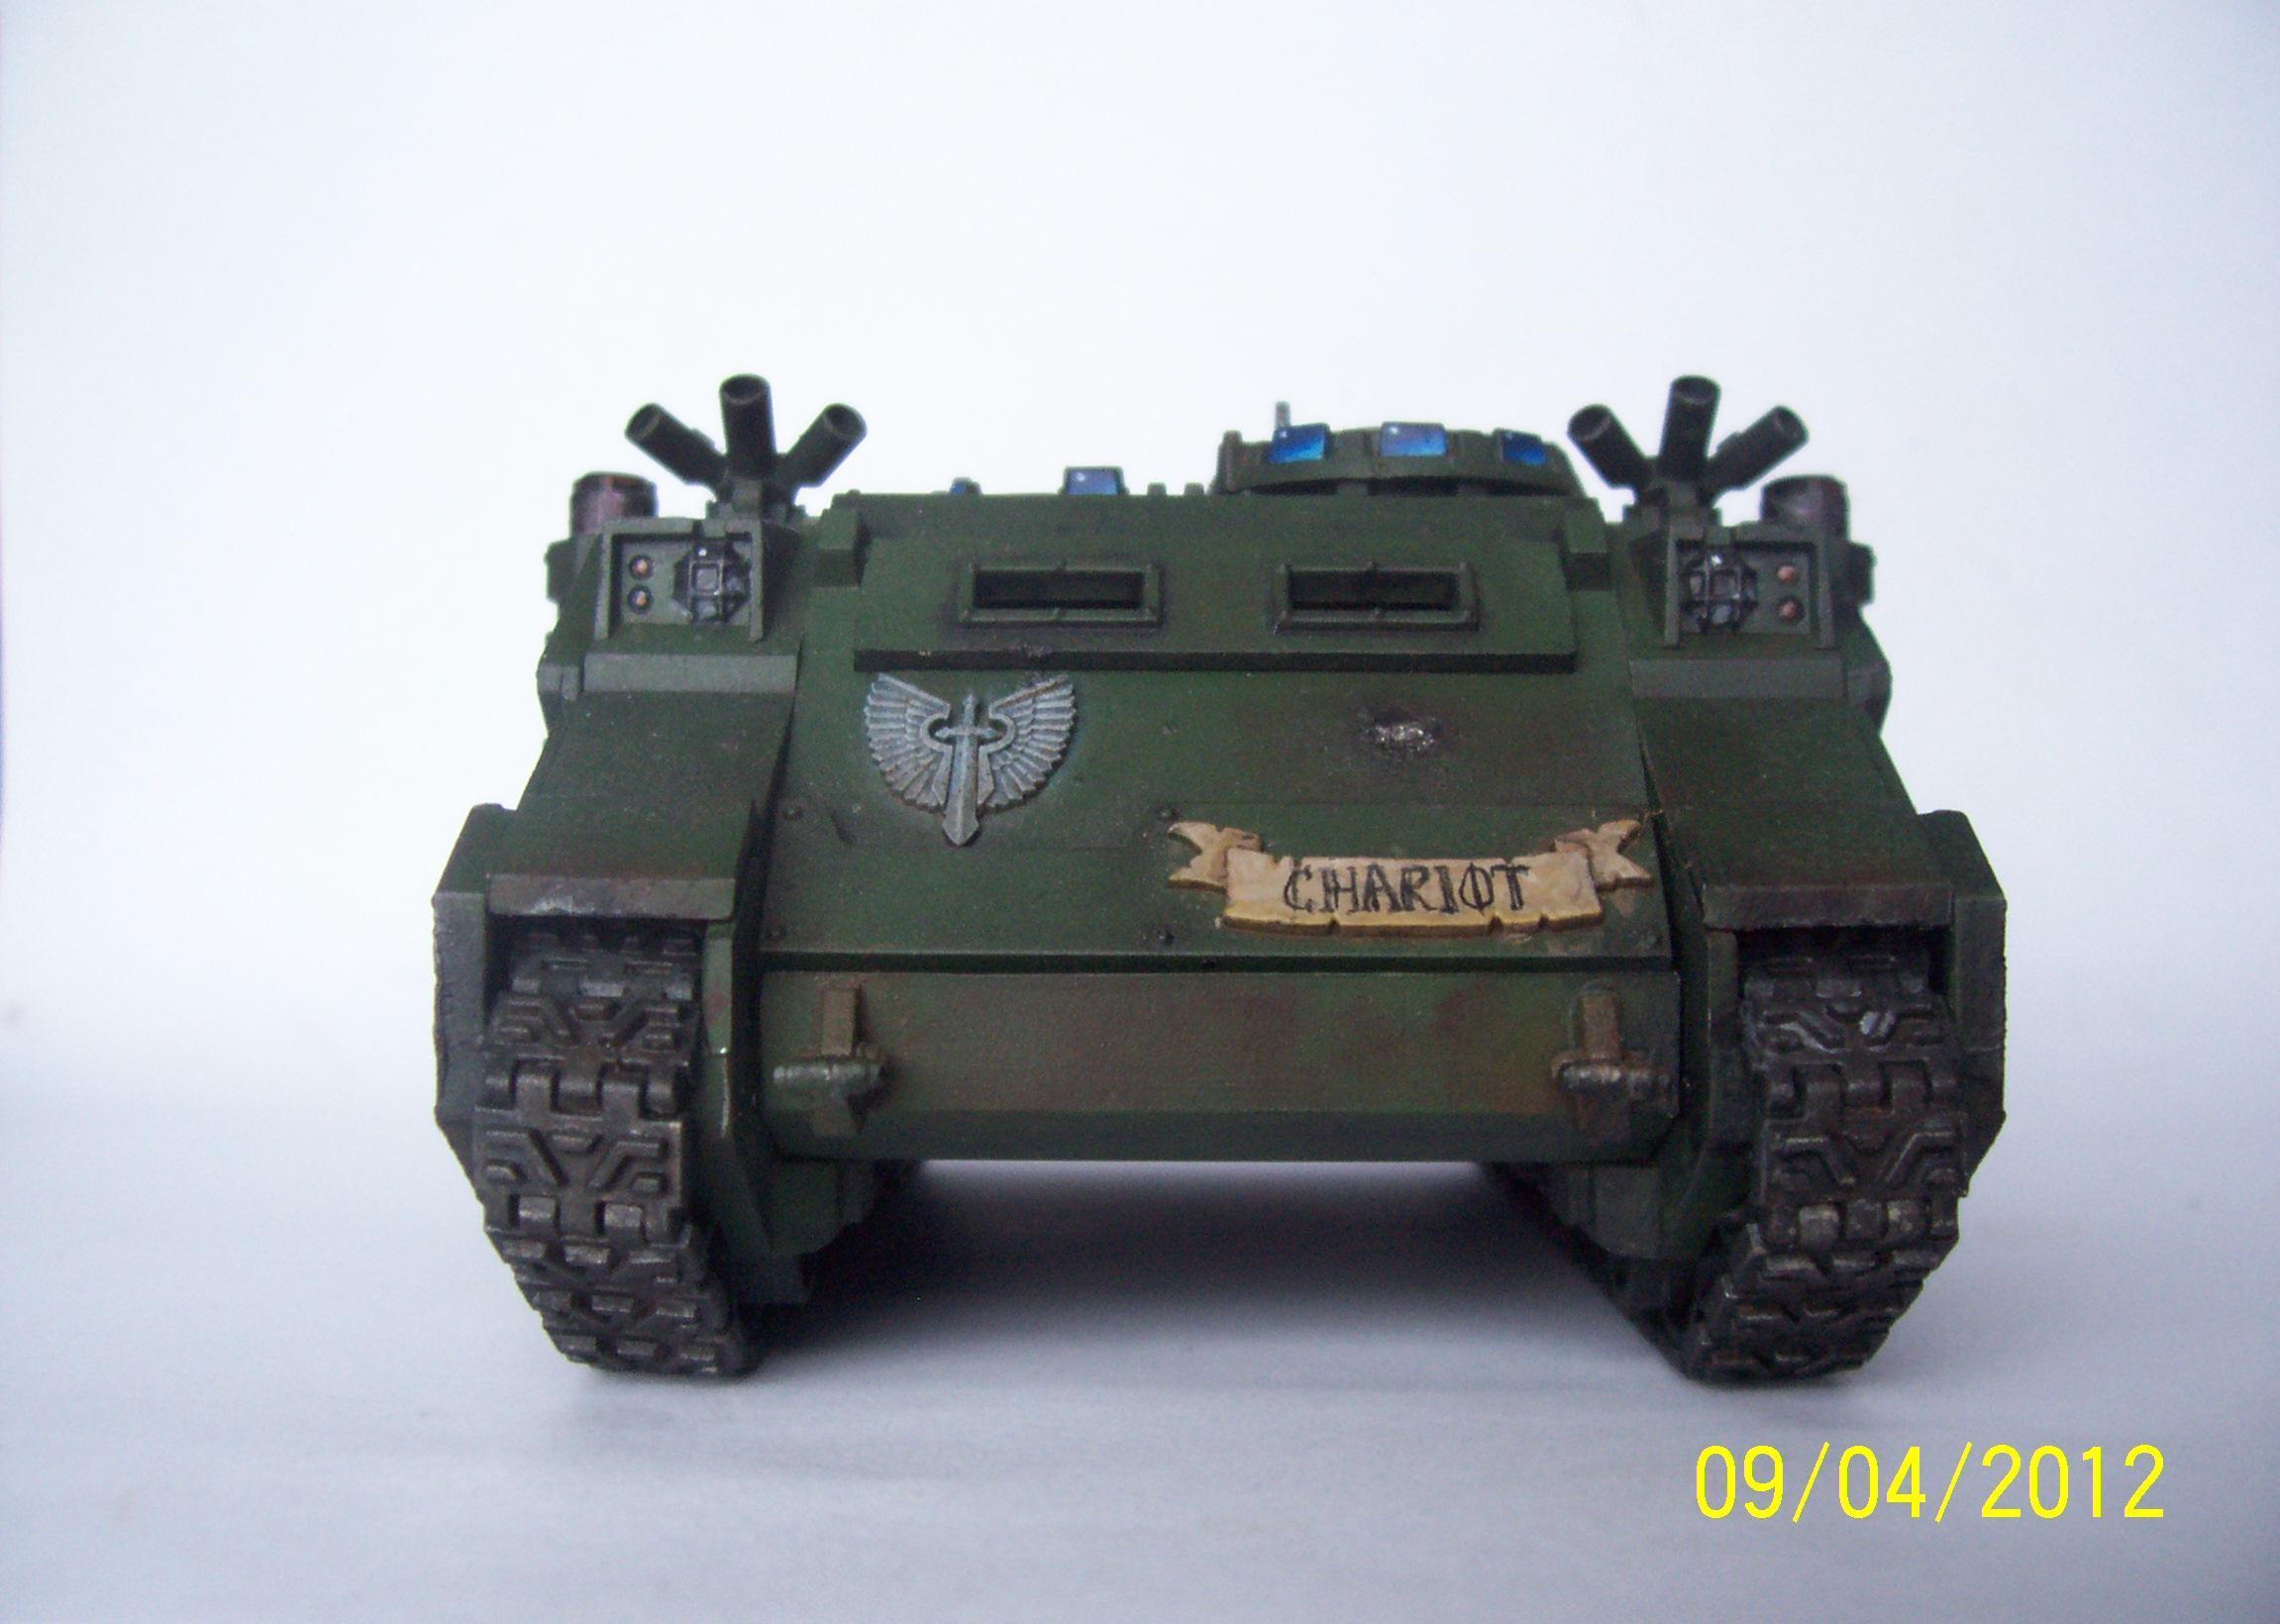 Chariot, Dark Angels, Front, Rhino, Tank